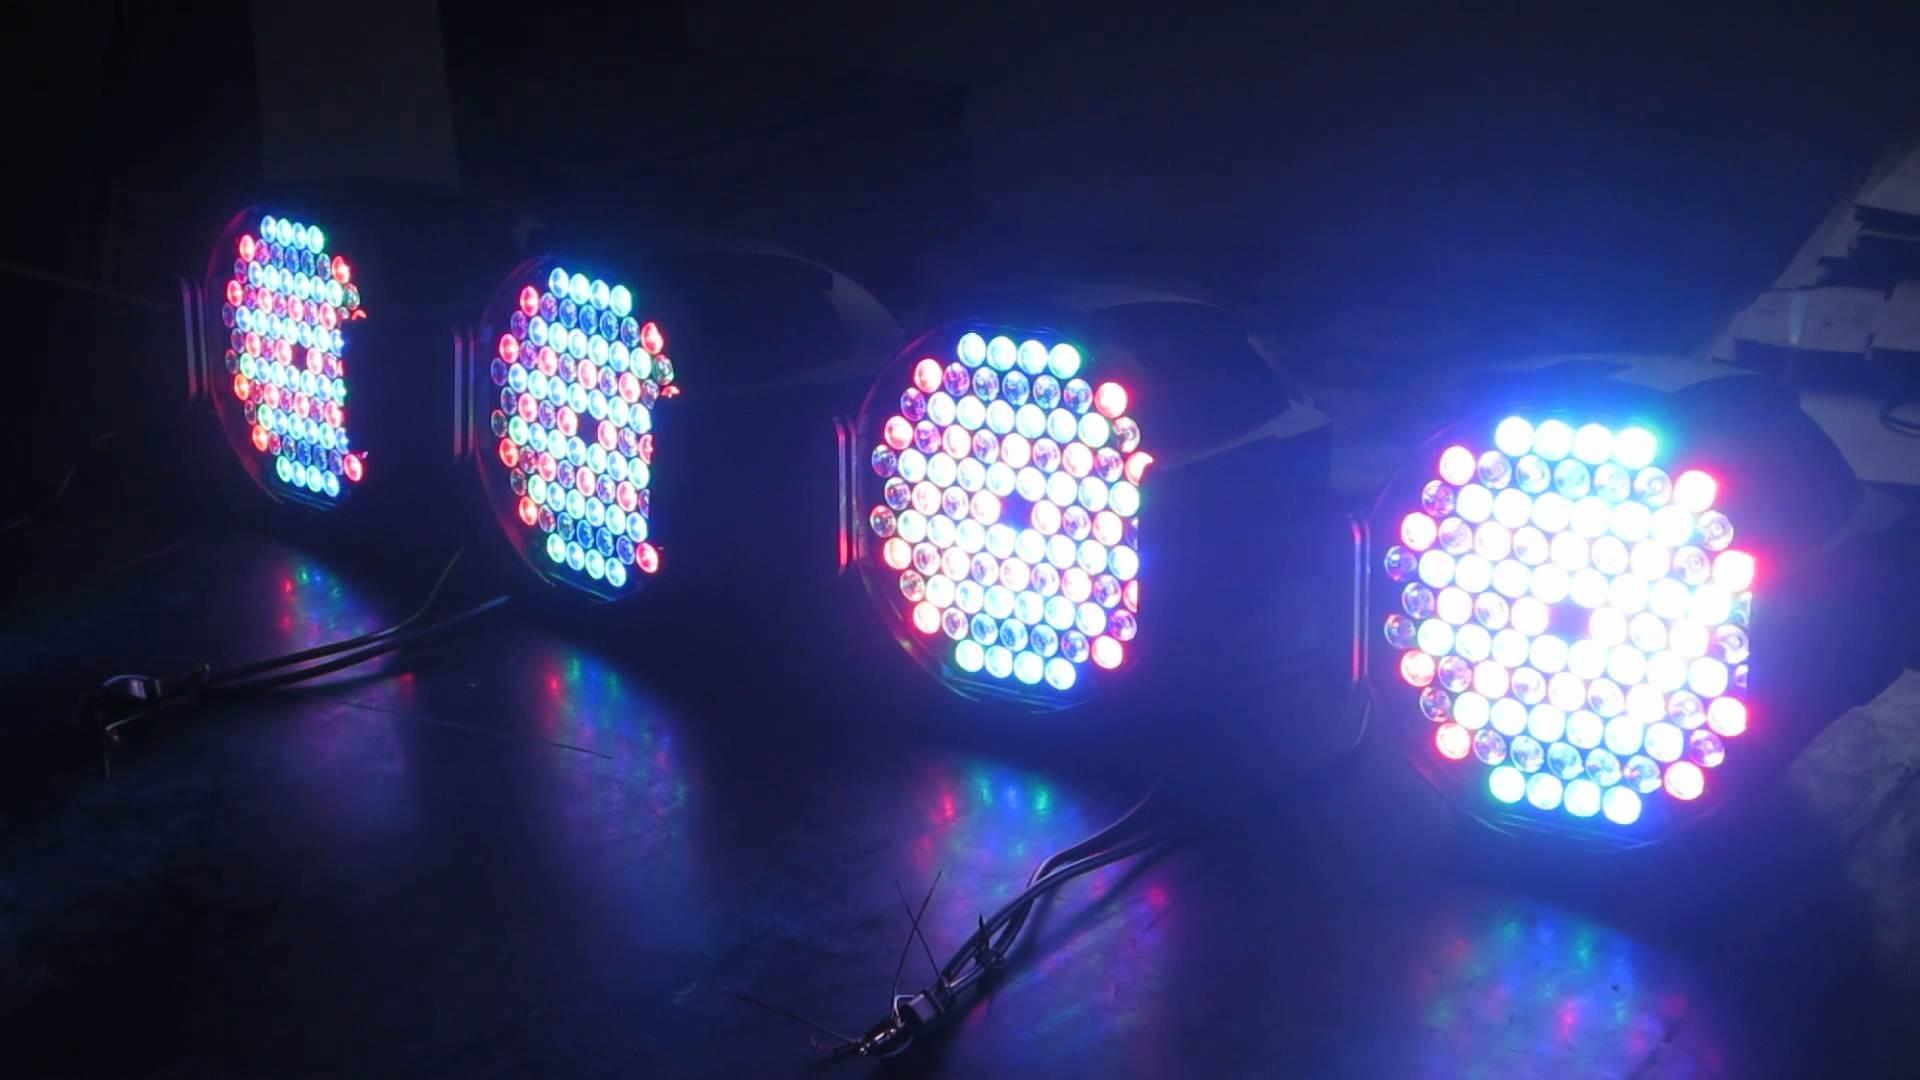 84*3w RGBWA led par light led stage lighting led wash light led par64